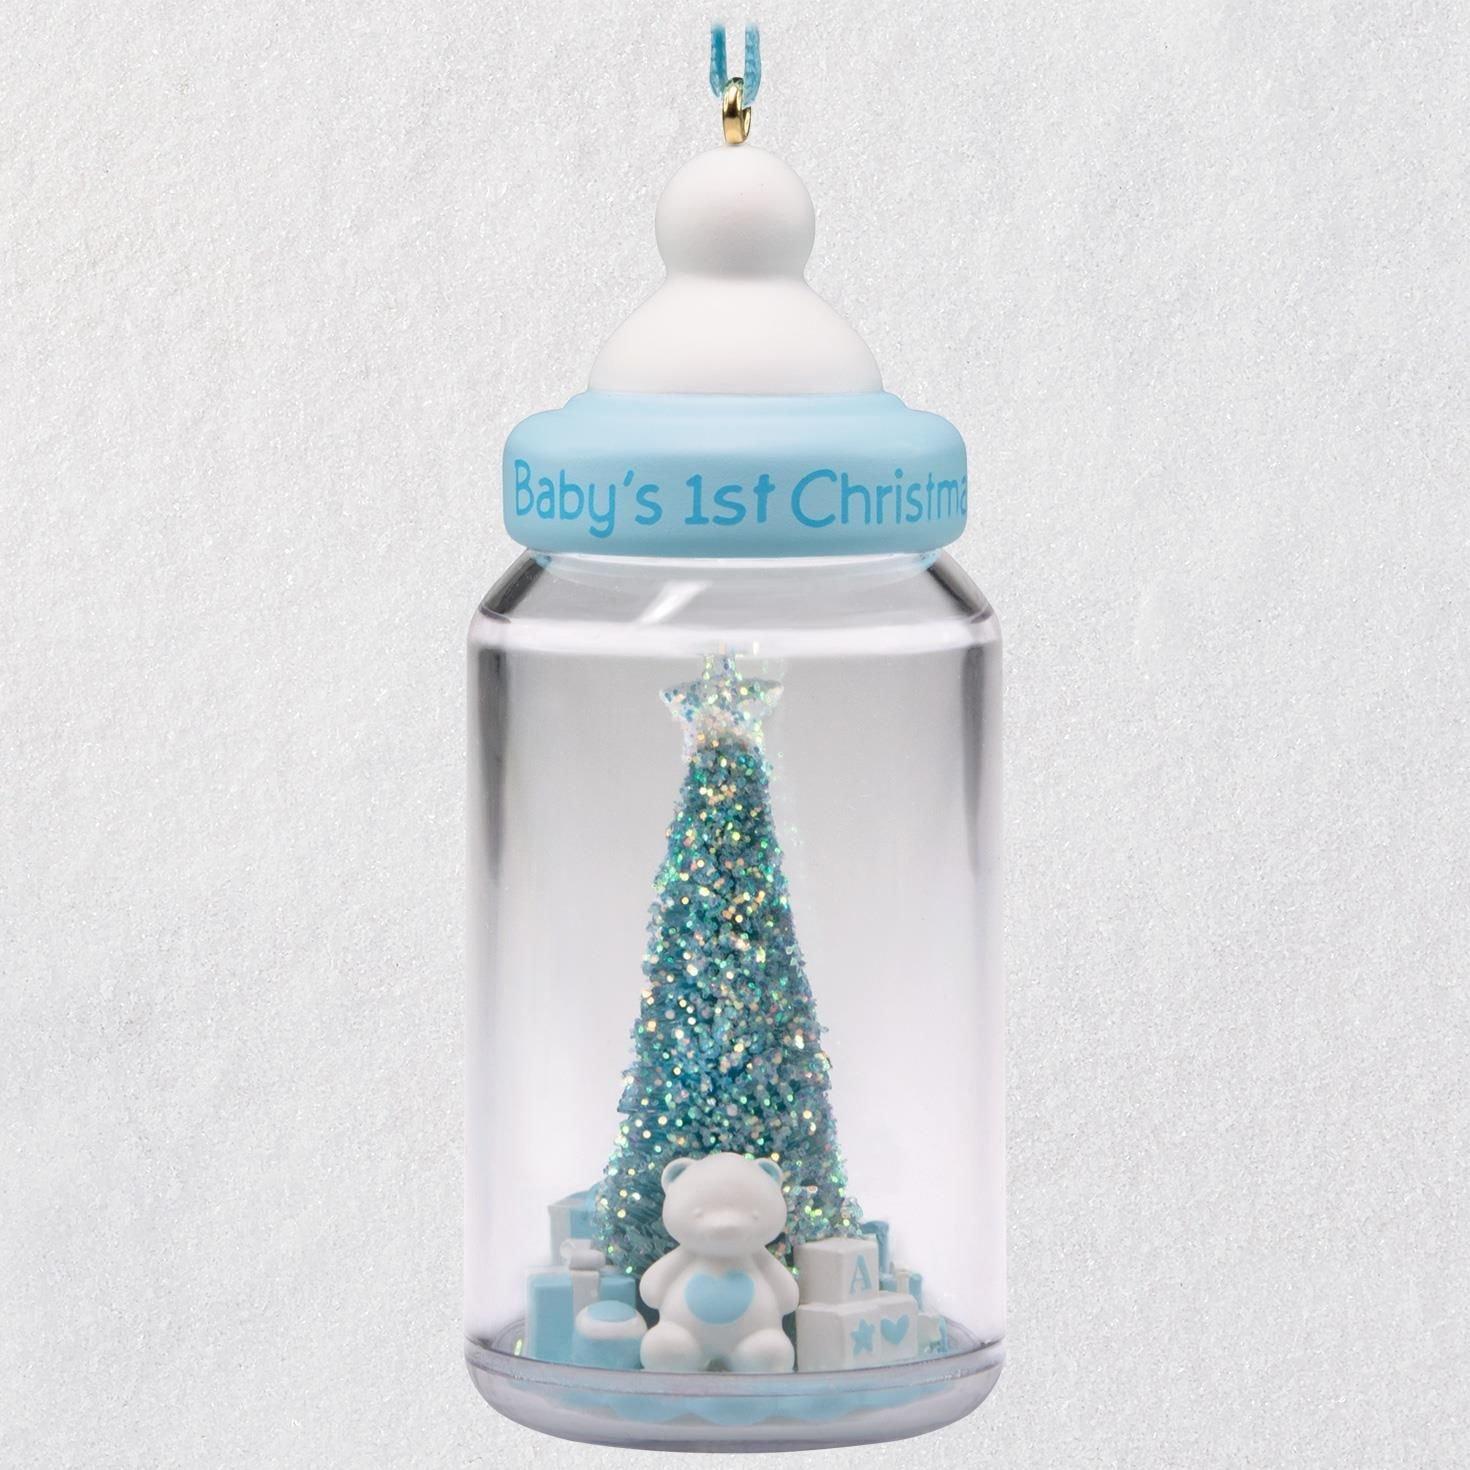 Hallmark Keepsake Christmas Ornament 2018 Year Dated, Baby Boy's First Christmas Baby Bottle